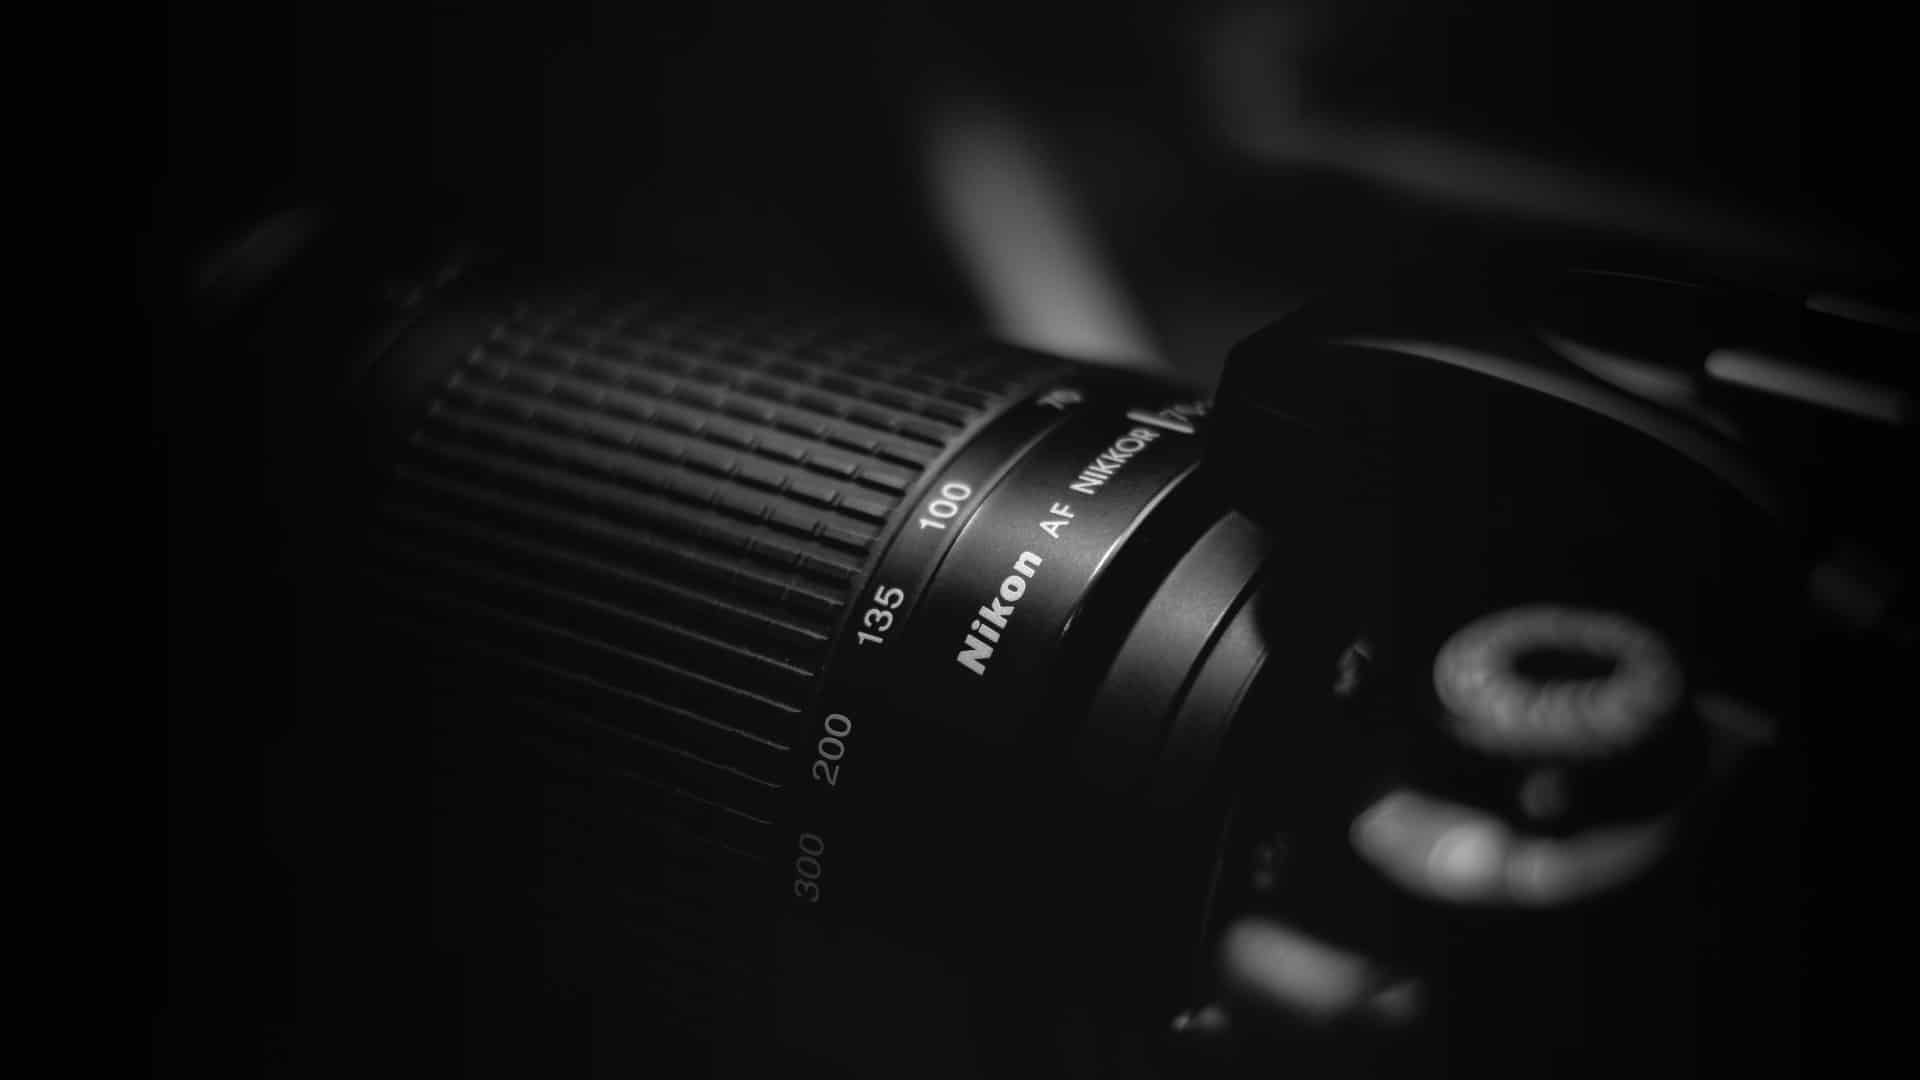 Best Nikon Camera Lenses - Header - StudioBinder